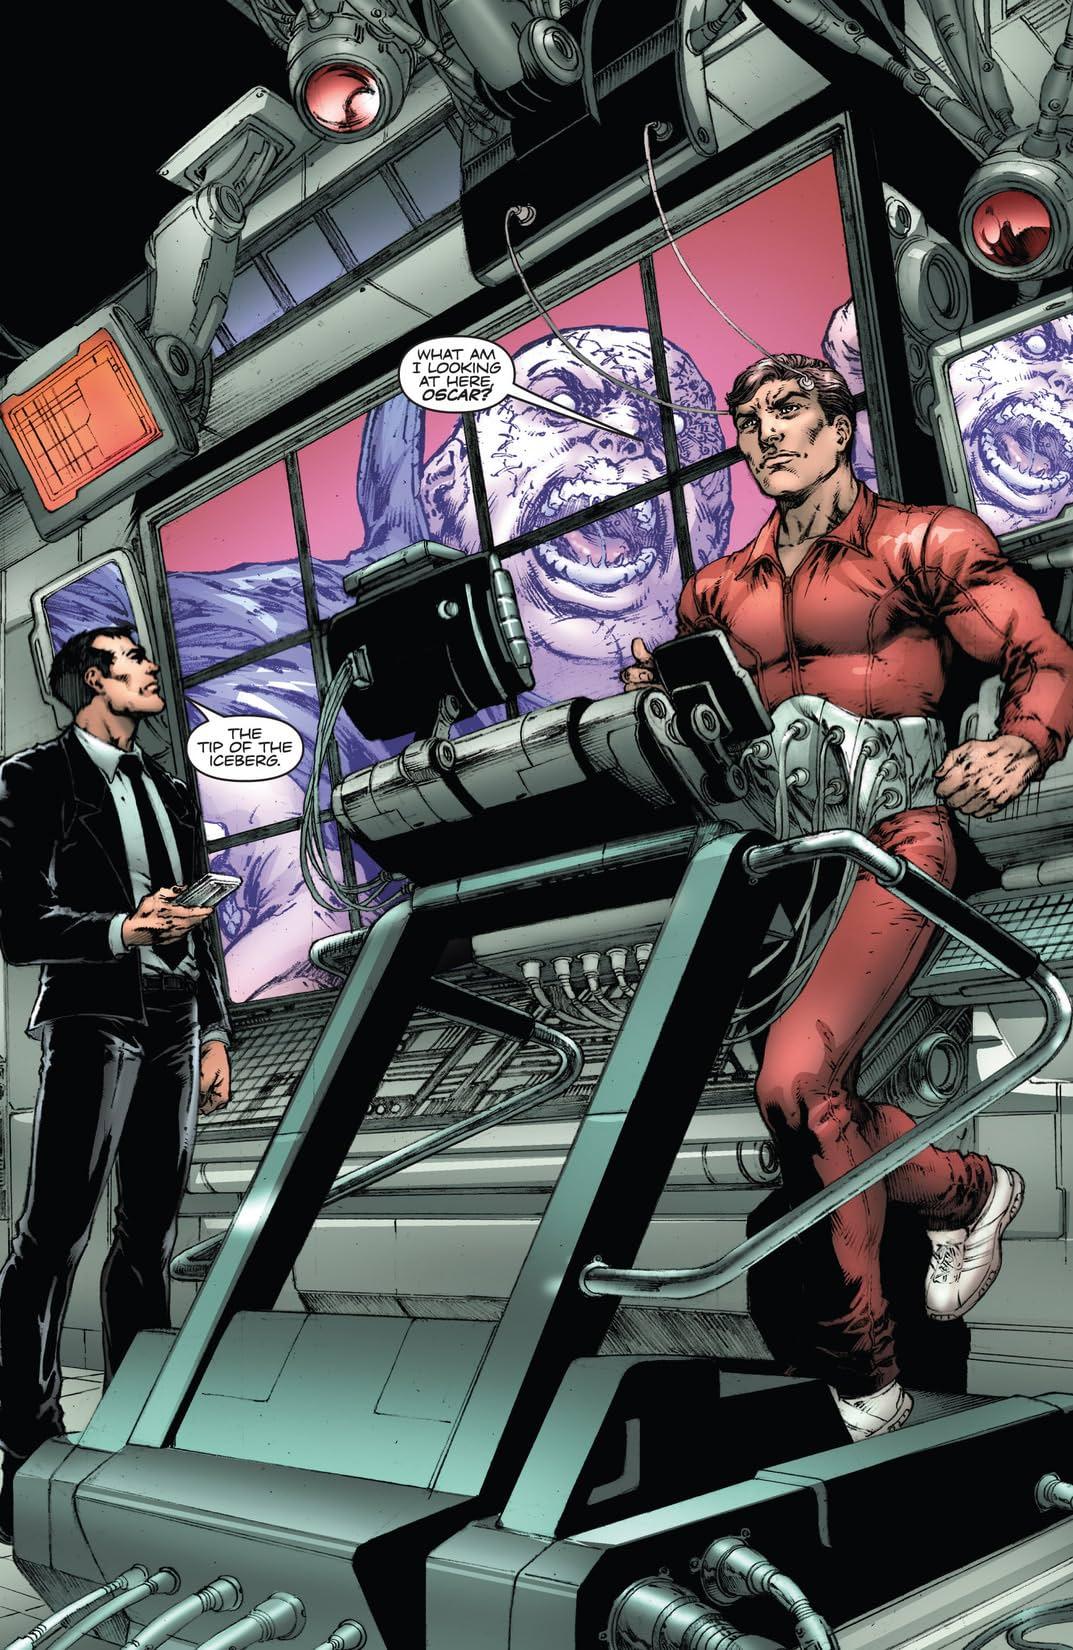 The Bionic Man vs. The Bionic Woman #1